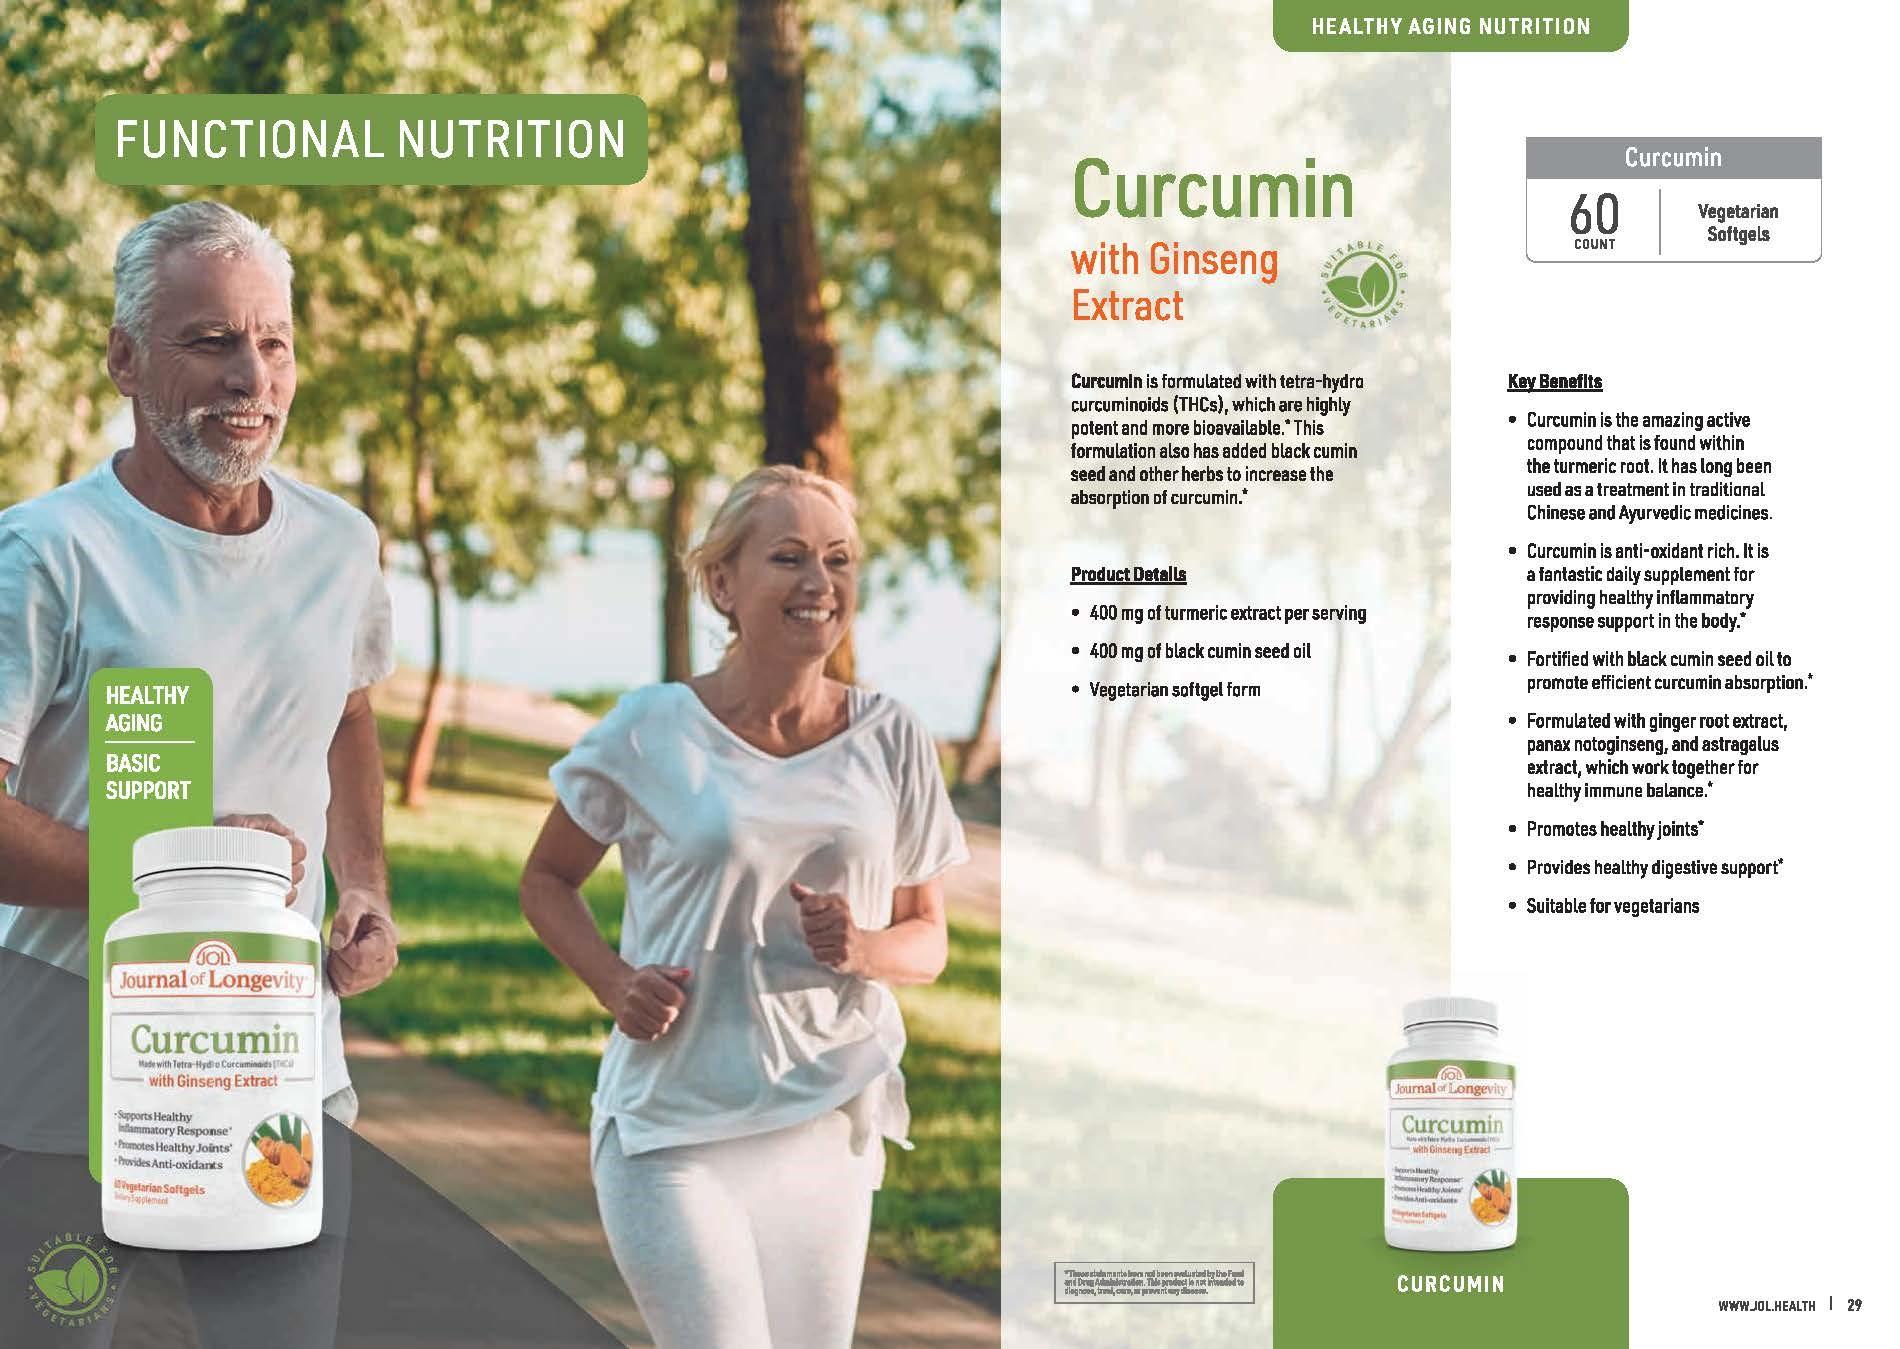 Journal of Longevity Curcumin Vegetarian softgel with Ginseng Extract